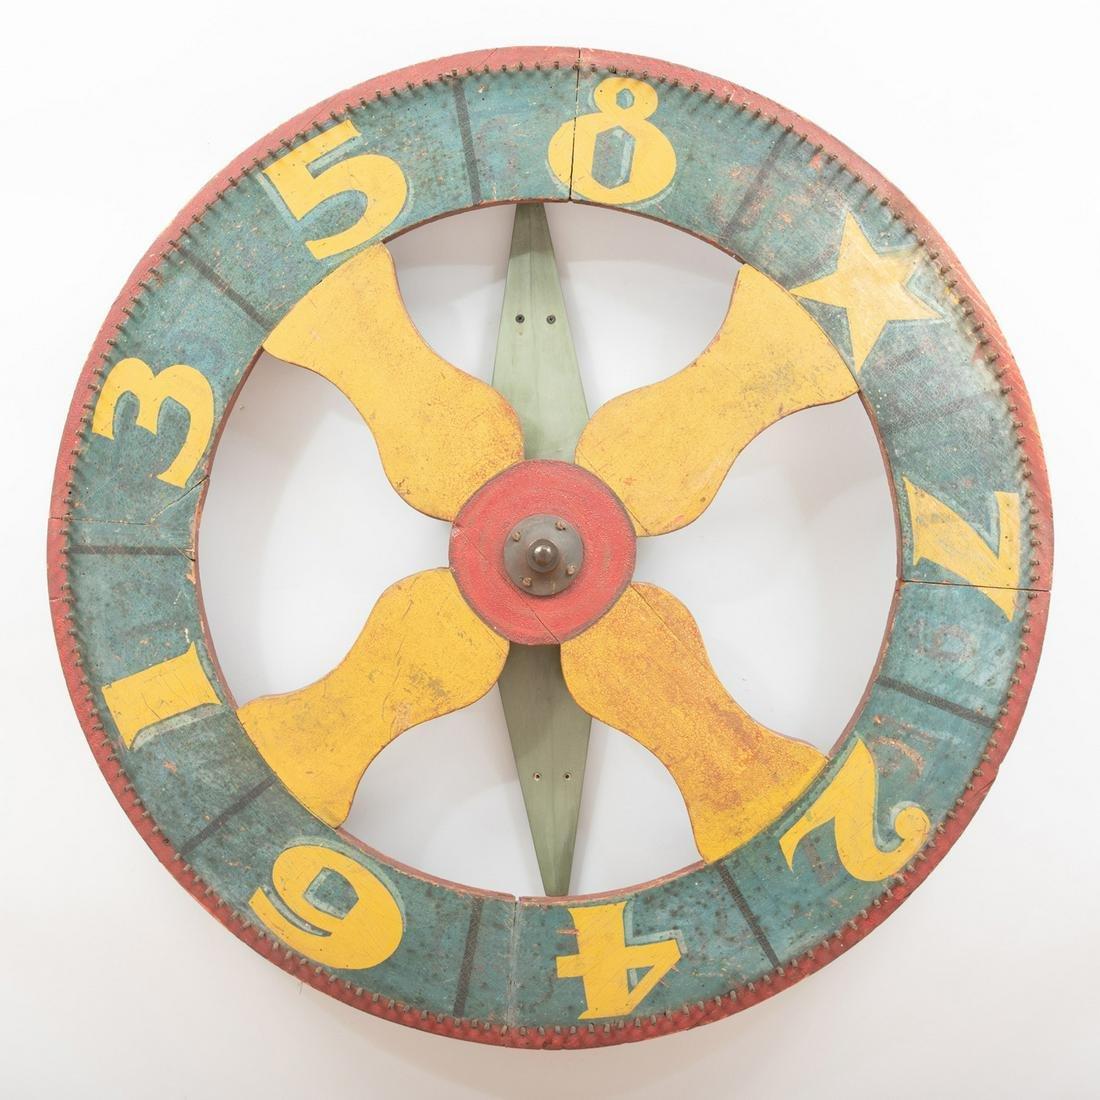 Folk Art Polychrome Painted Game Wheel